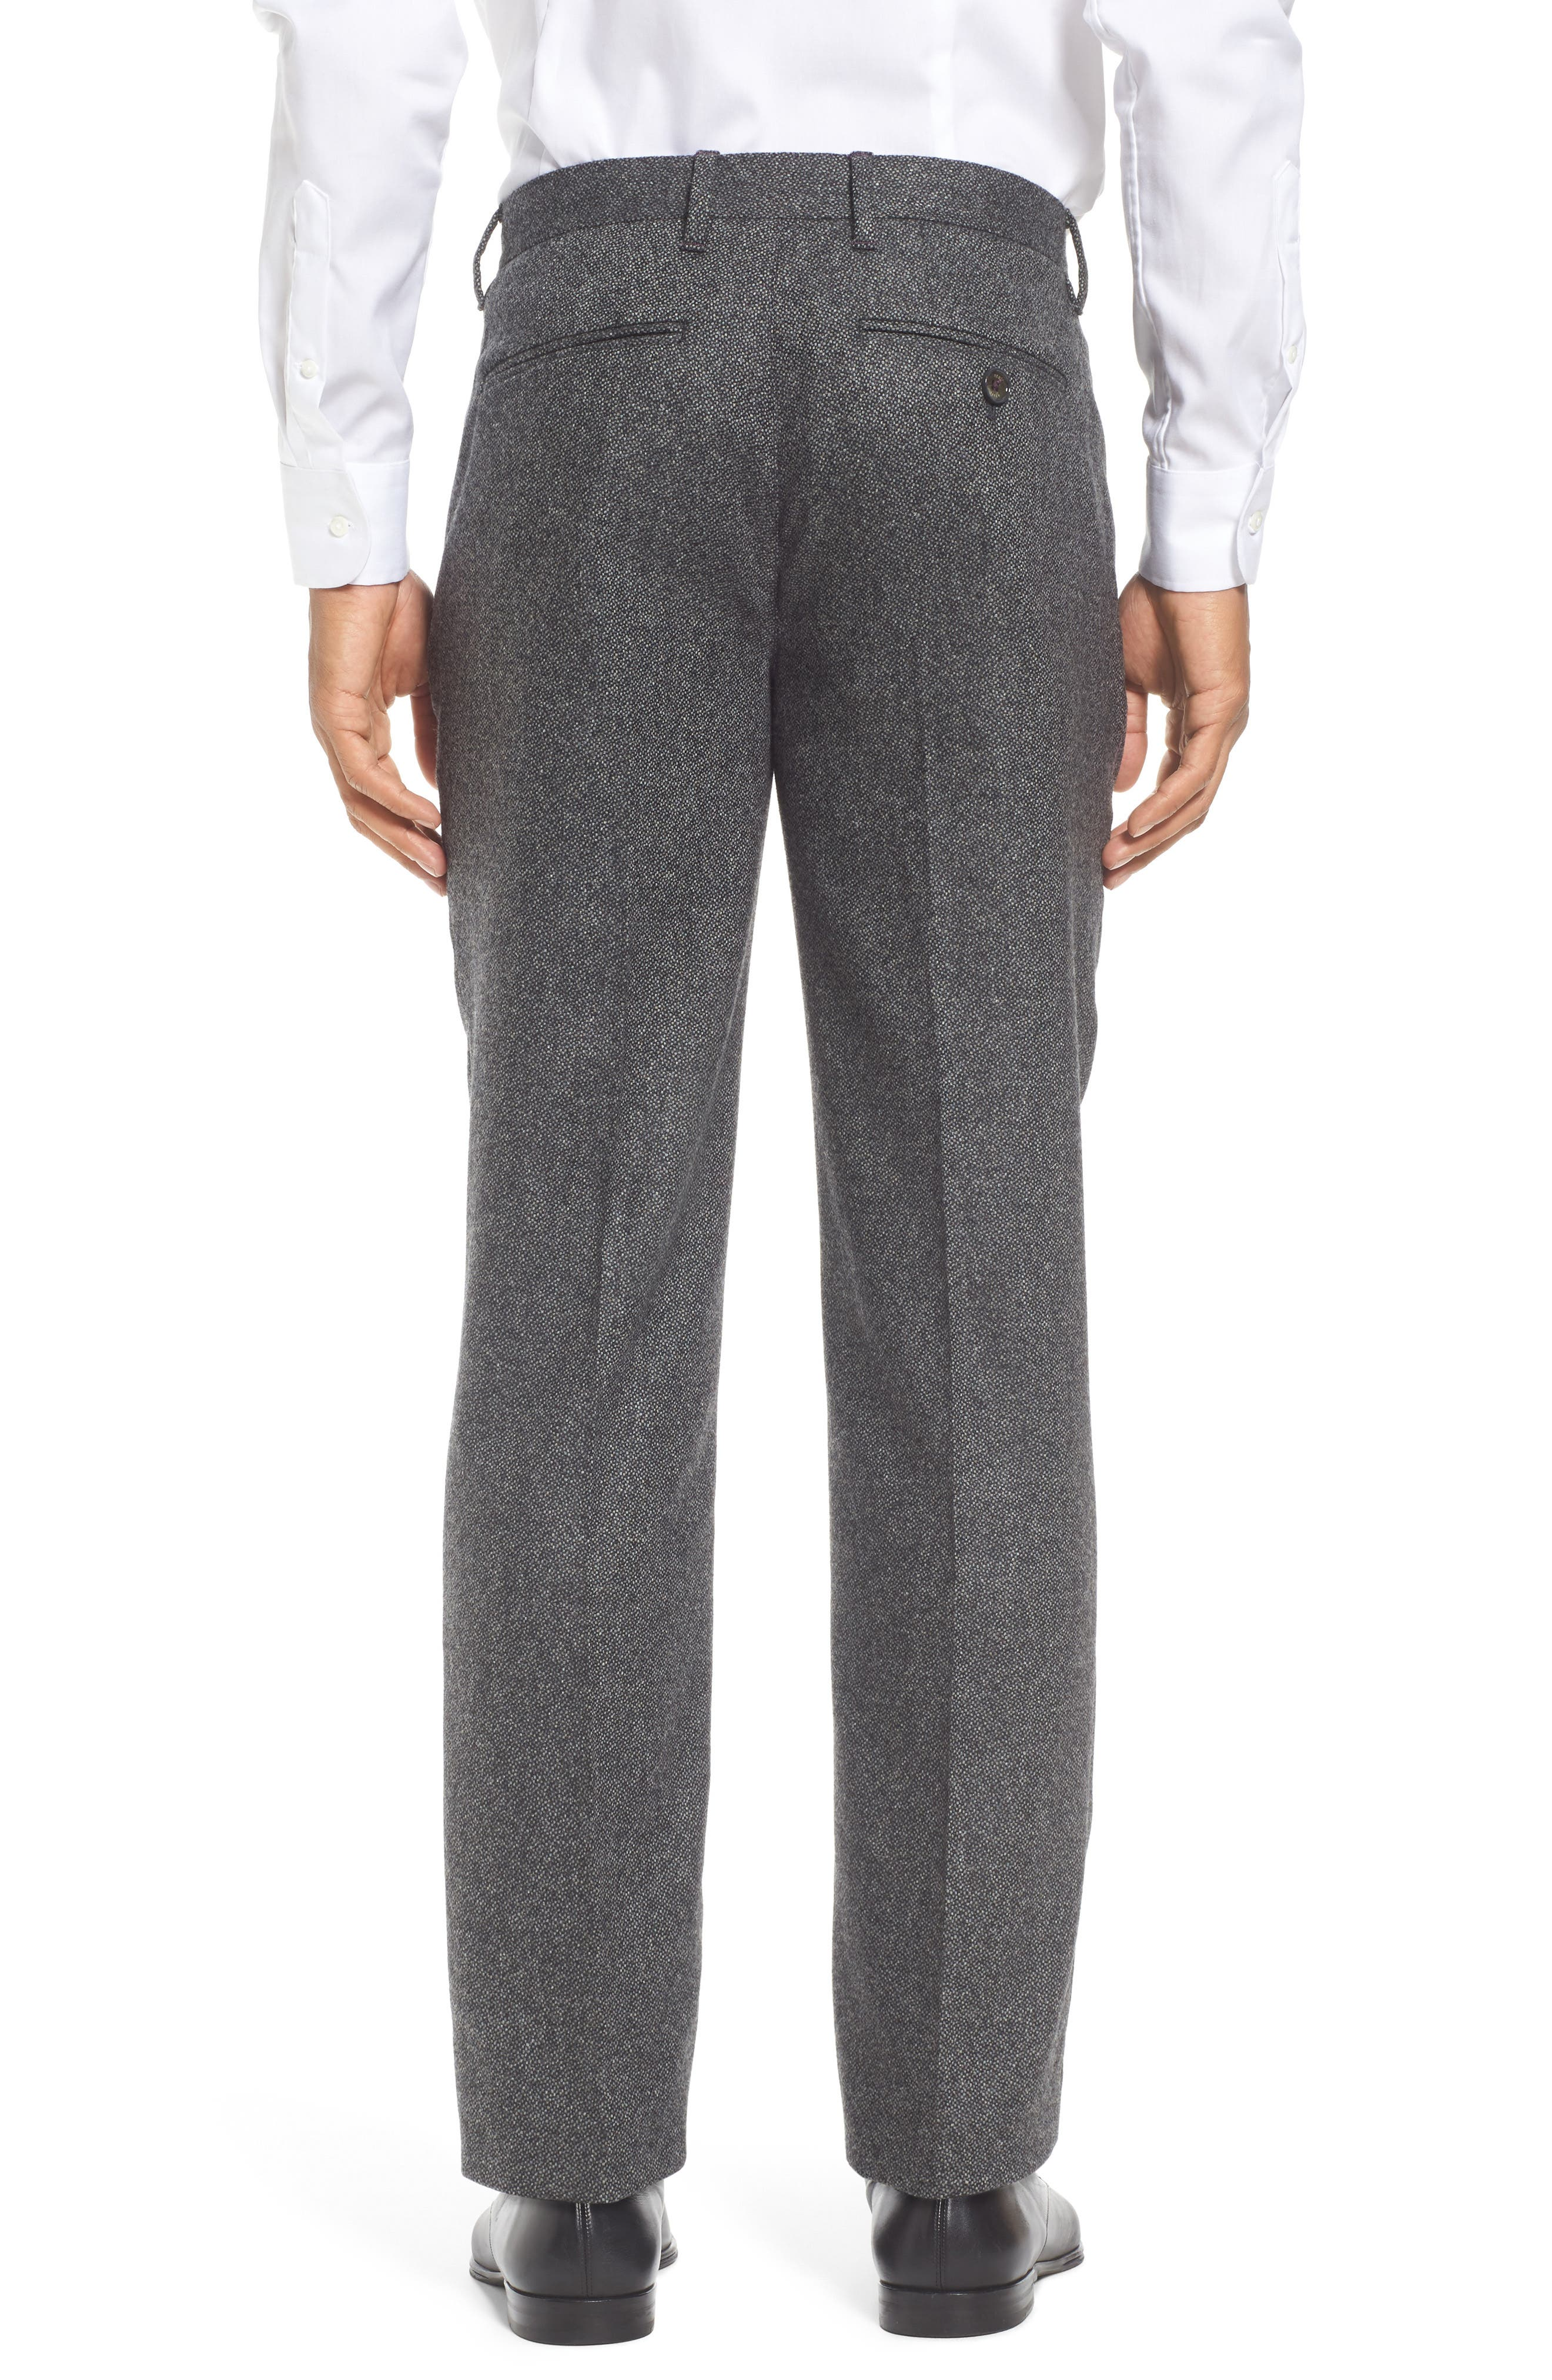 Modern Slim Fit Trousers,                             Alternate thumbnail 2, color,                             010